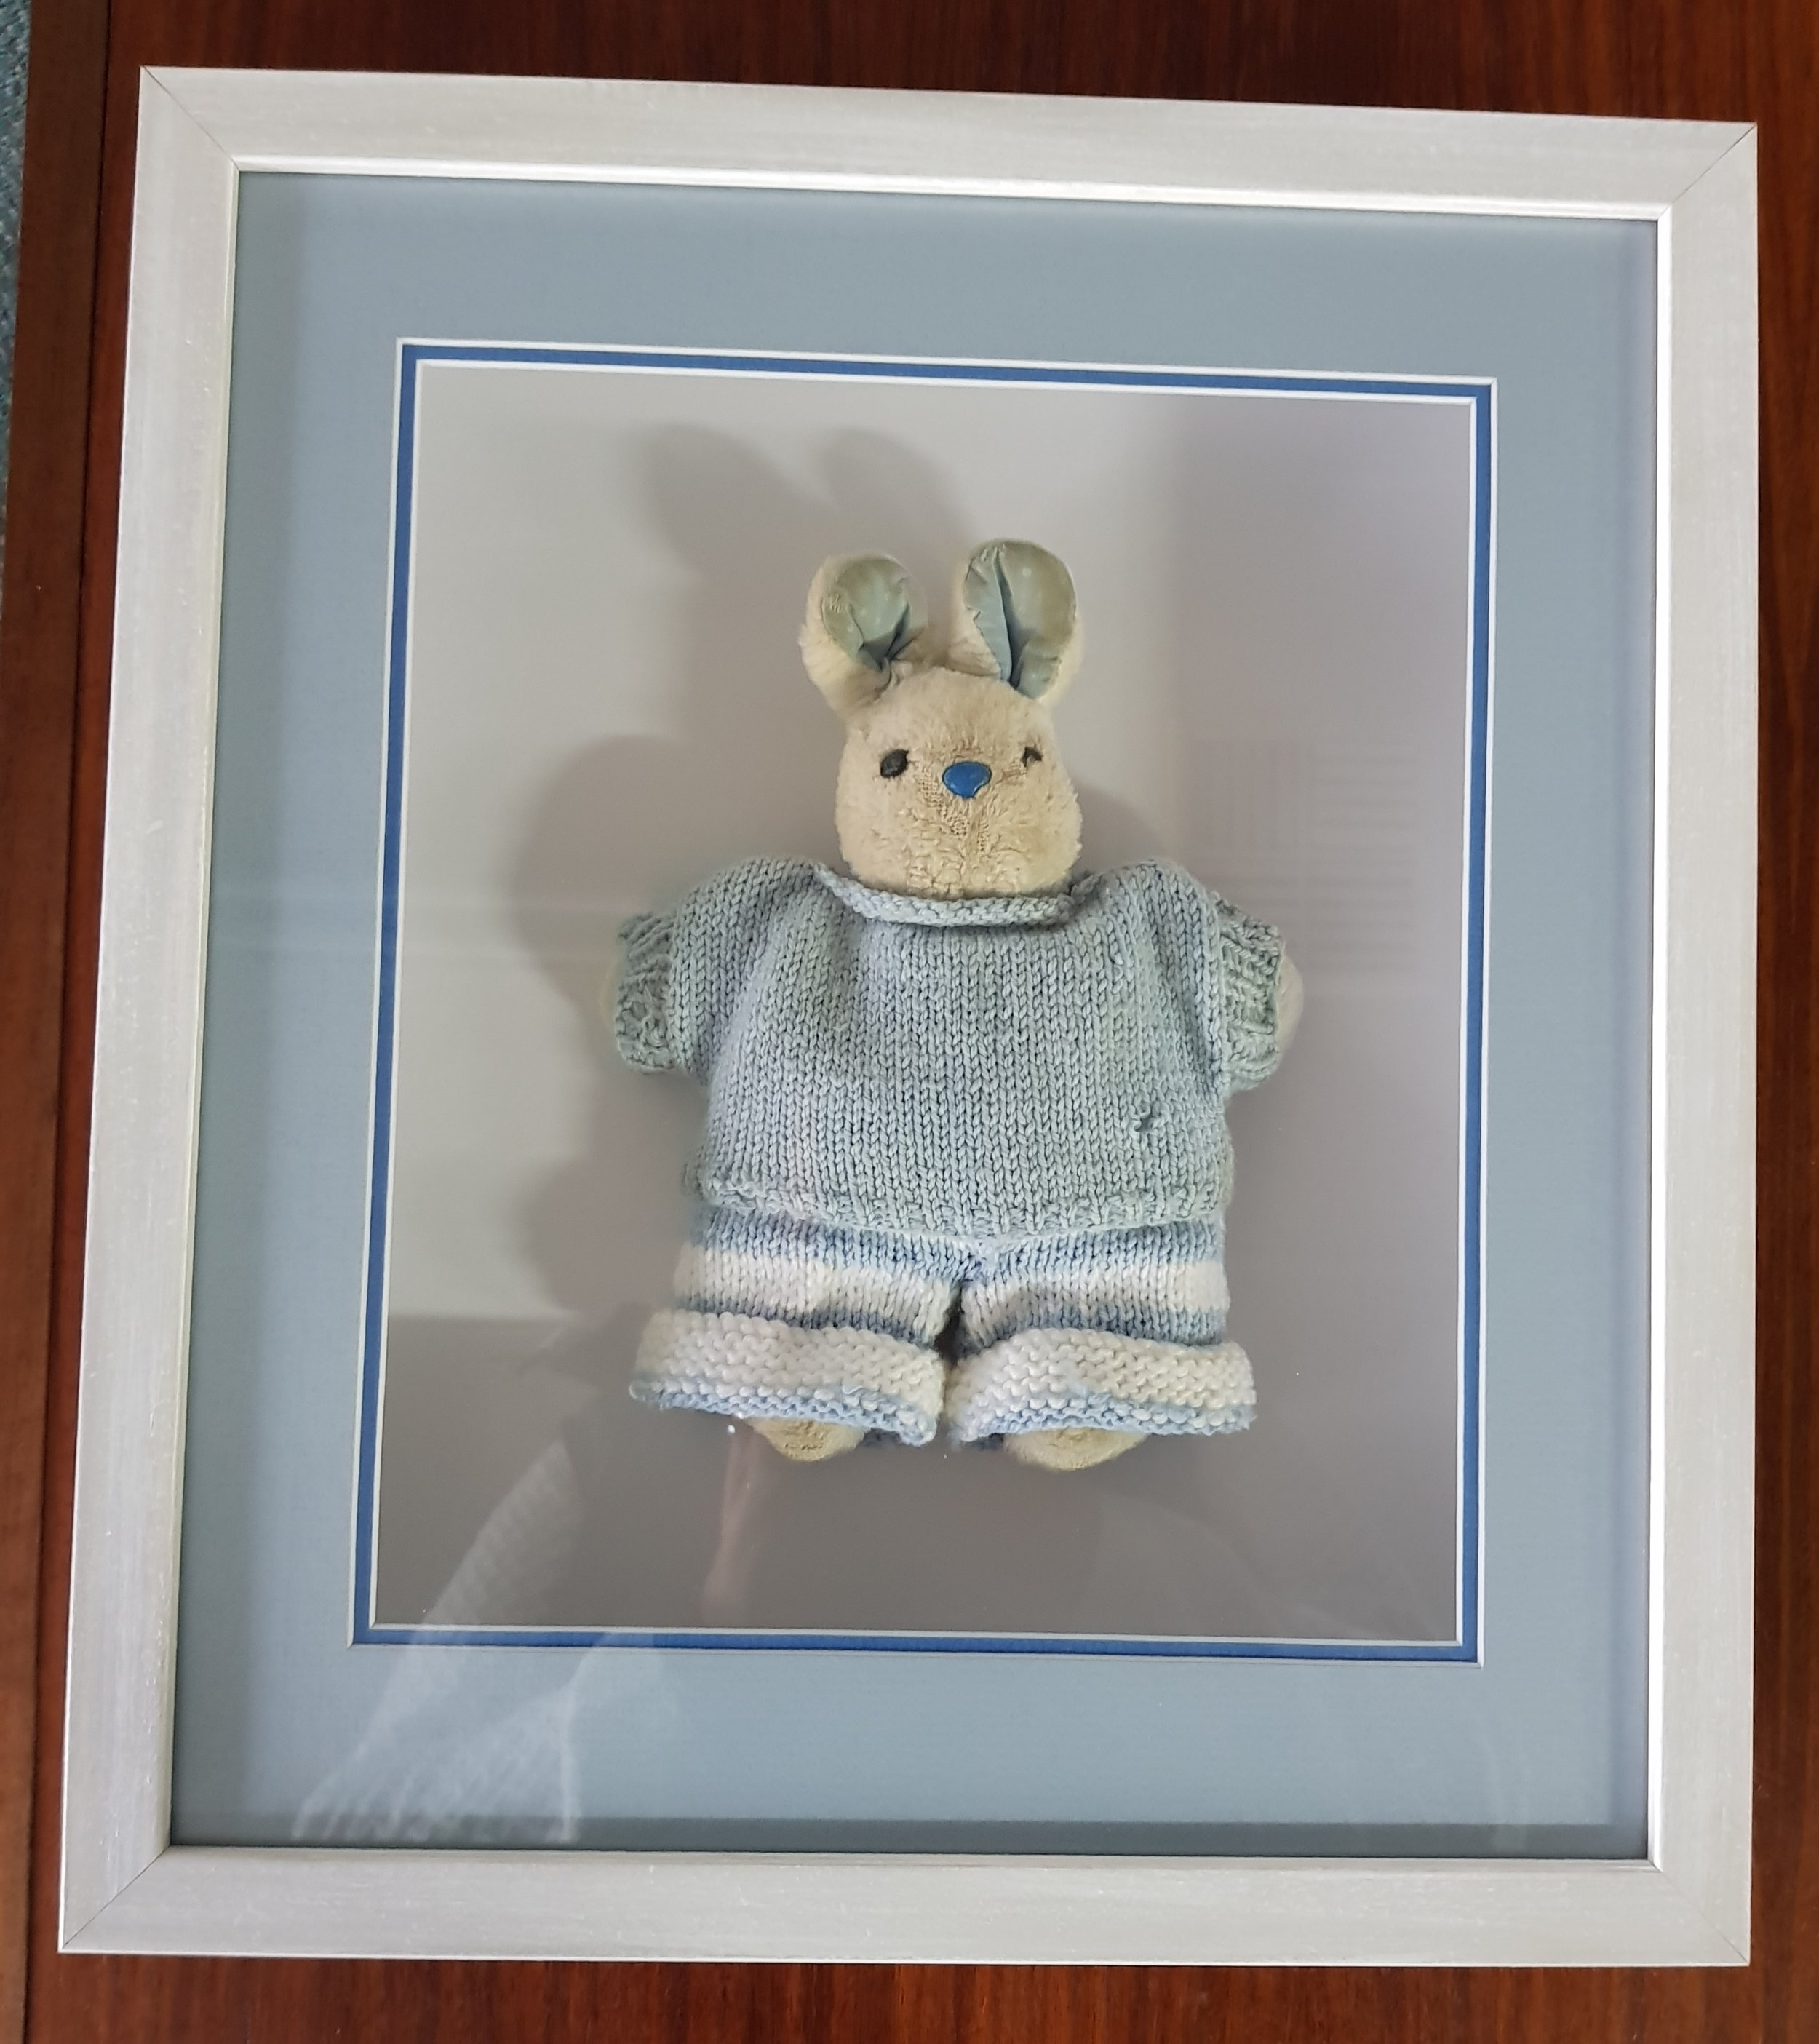 30 plus year old baby rabbit